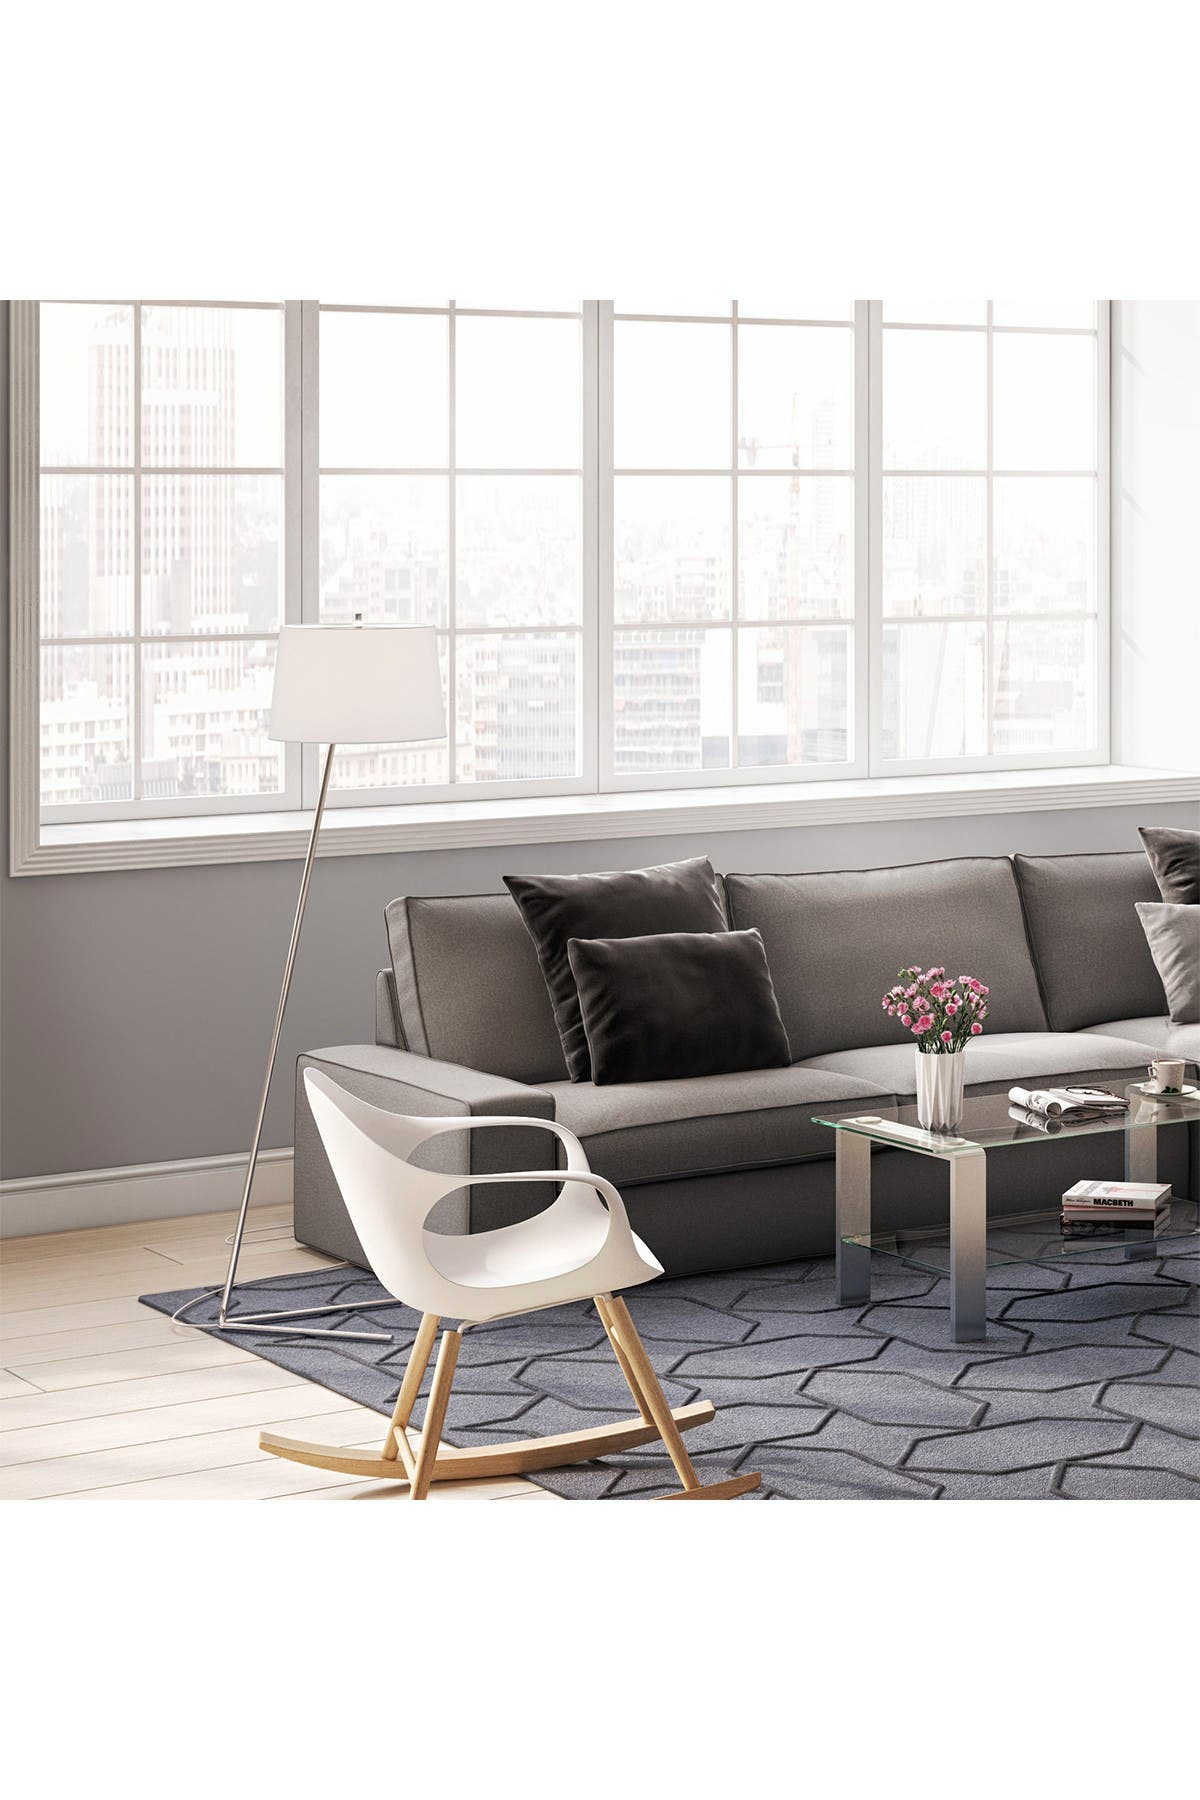 Image of Addison and Lane Markos Floor Lamp - Nickel